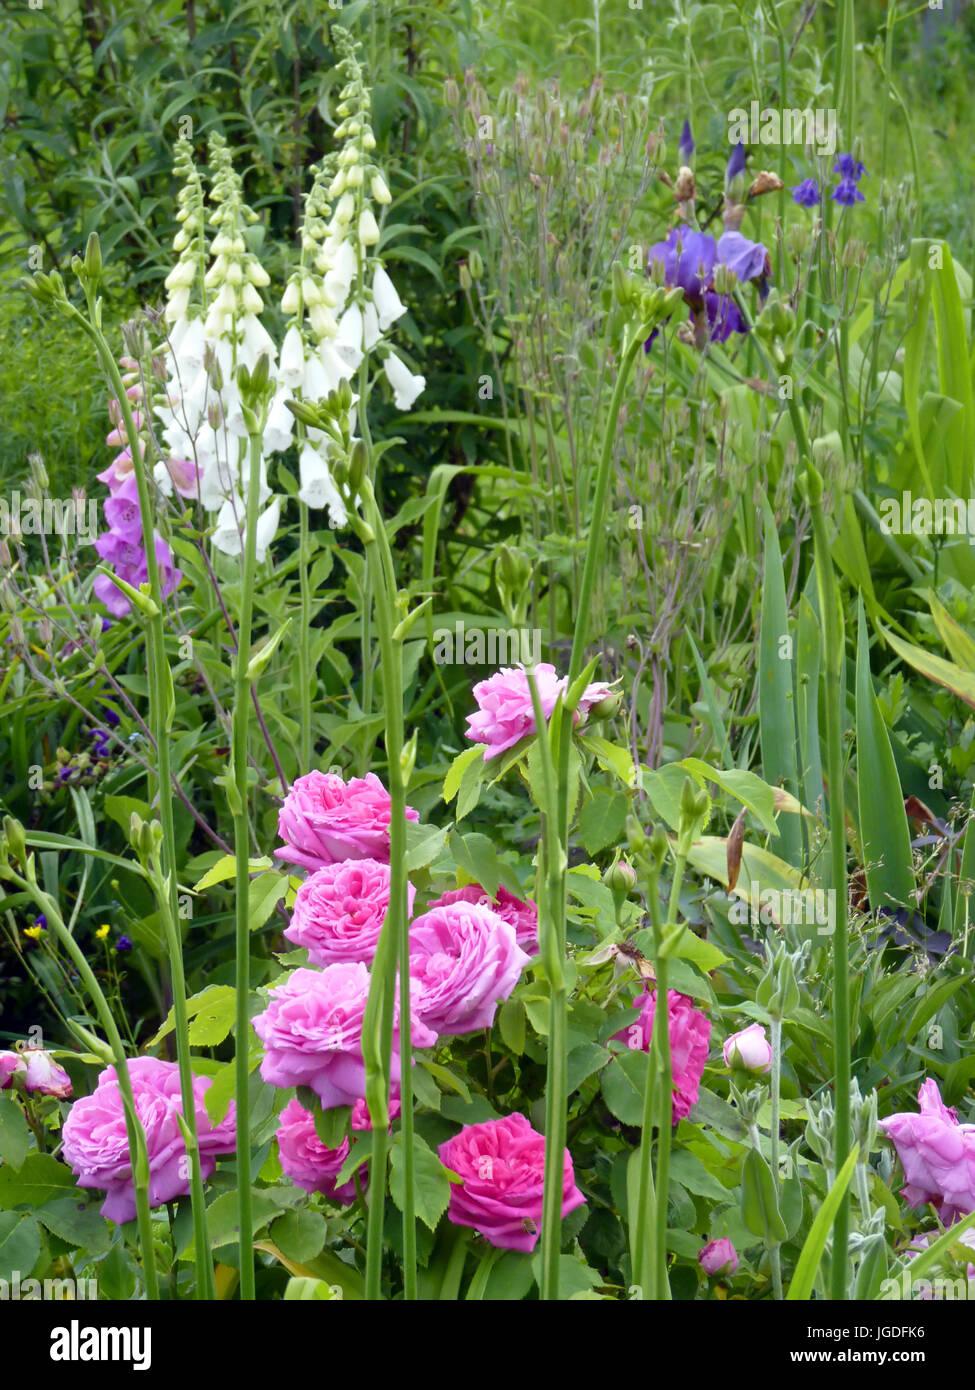 Flower garden with pink rosesiris and foxgloves stock photo flower garden with pink rosesiris and foxgloves izmirmasajfo